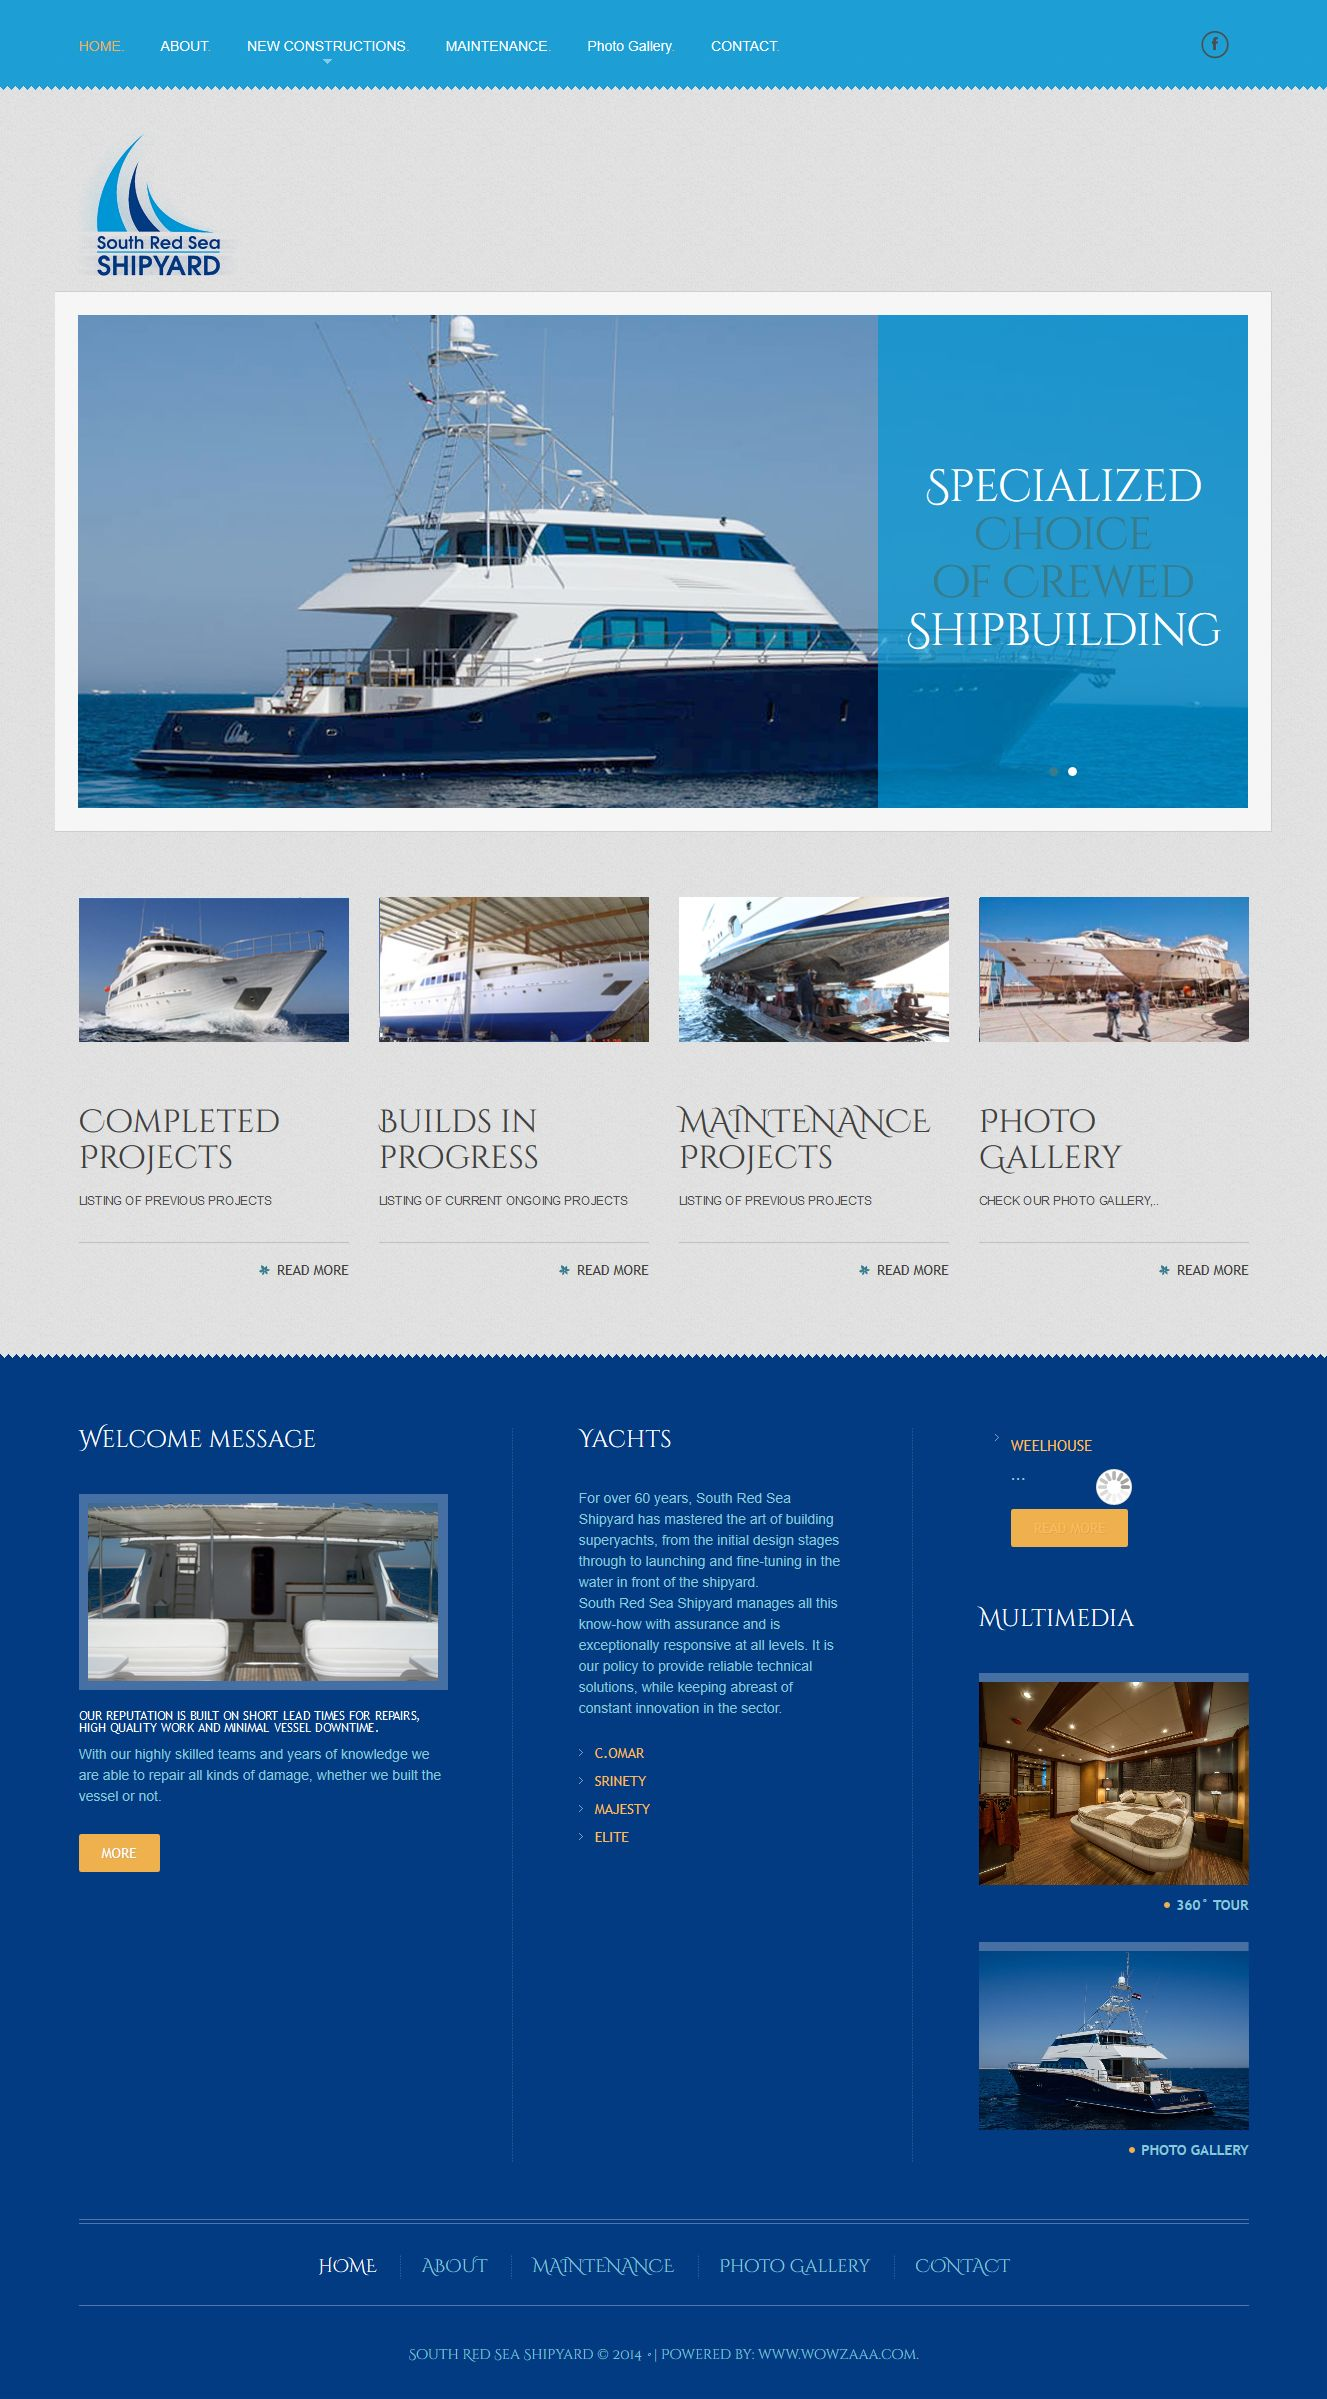 srss egypt web design